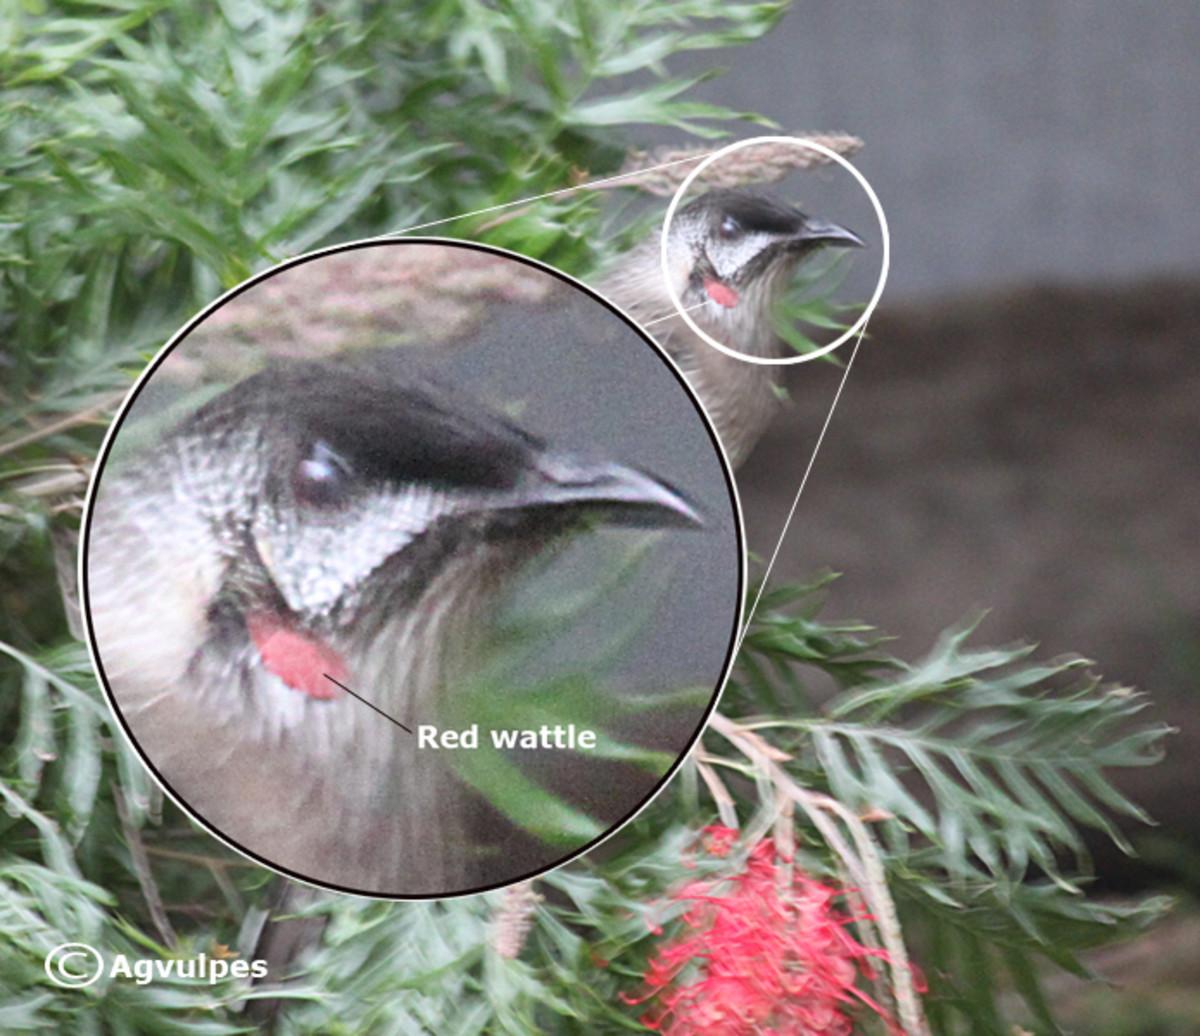 The Wattle of  the Red Wattle Bird.